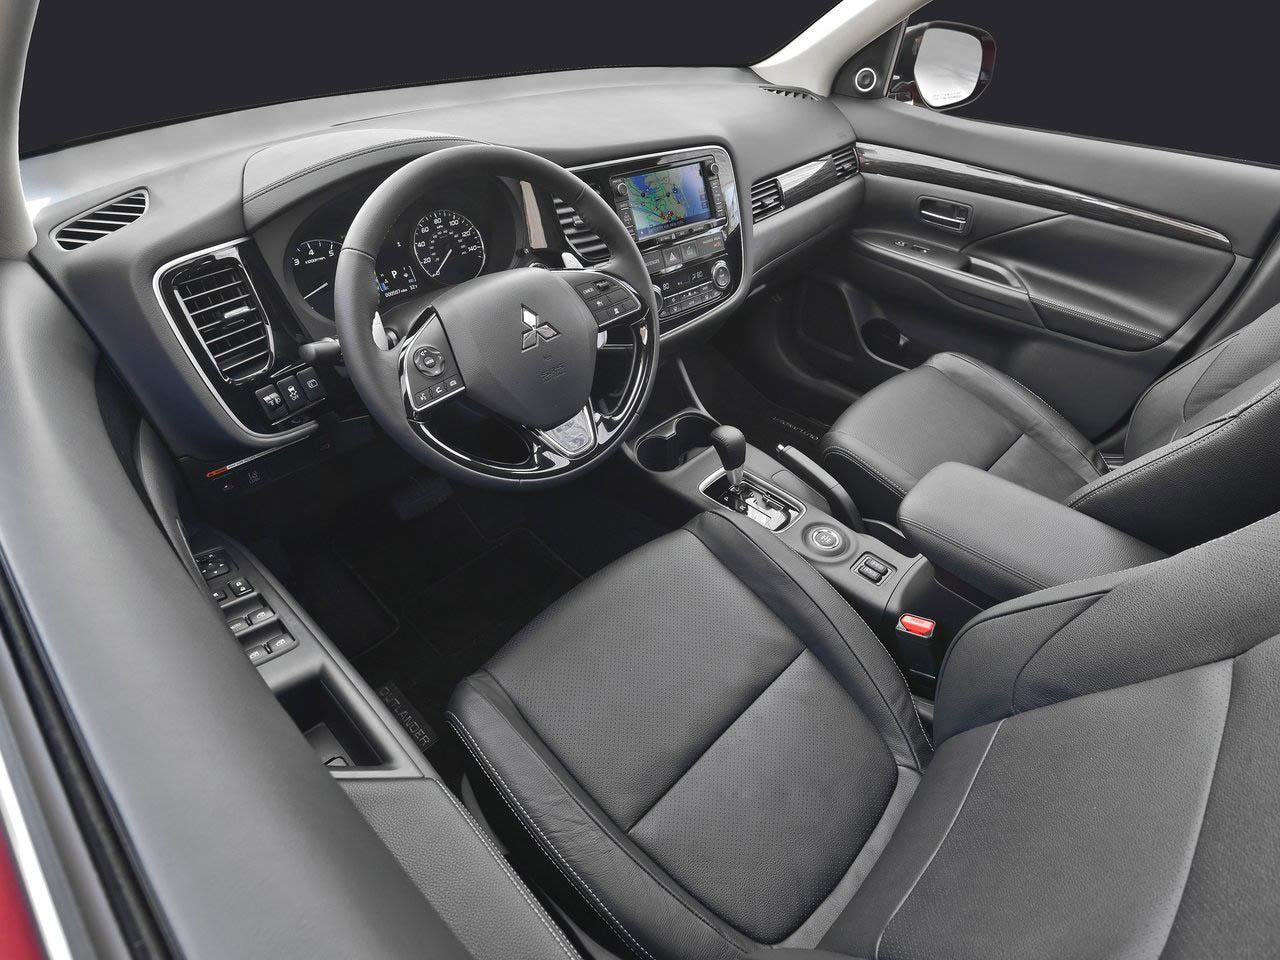 Mitsubishi Outlander Interior نمای داخلی میتسوبیشی اوتلندر